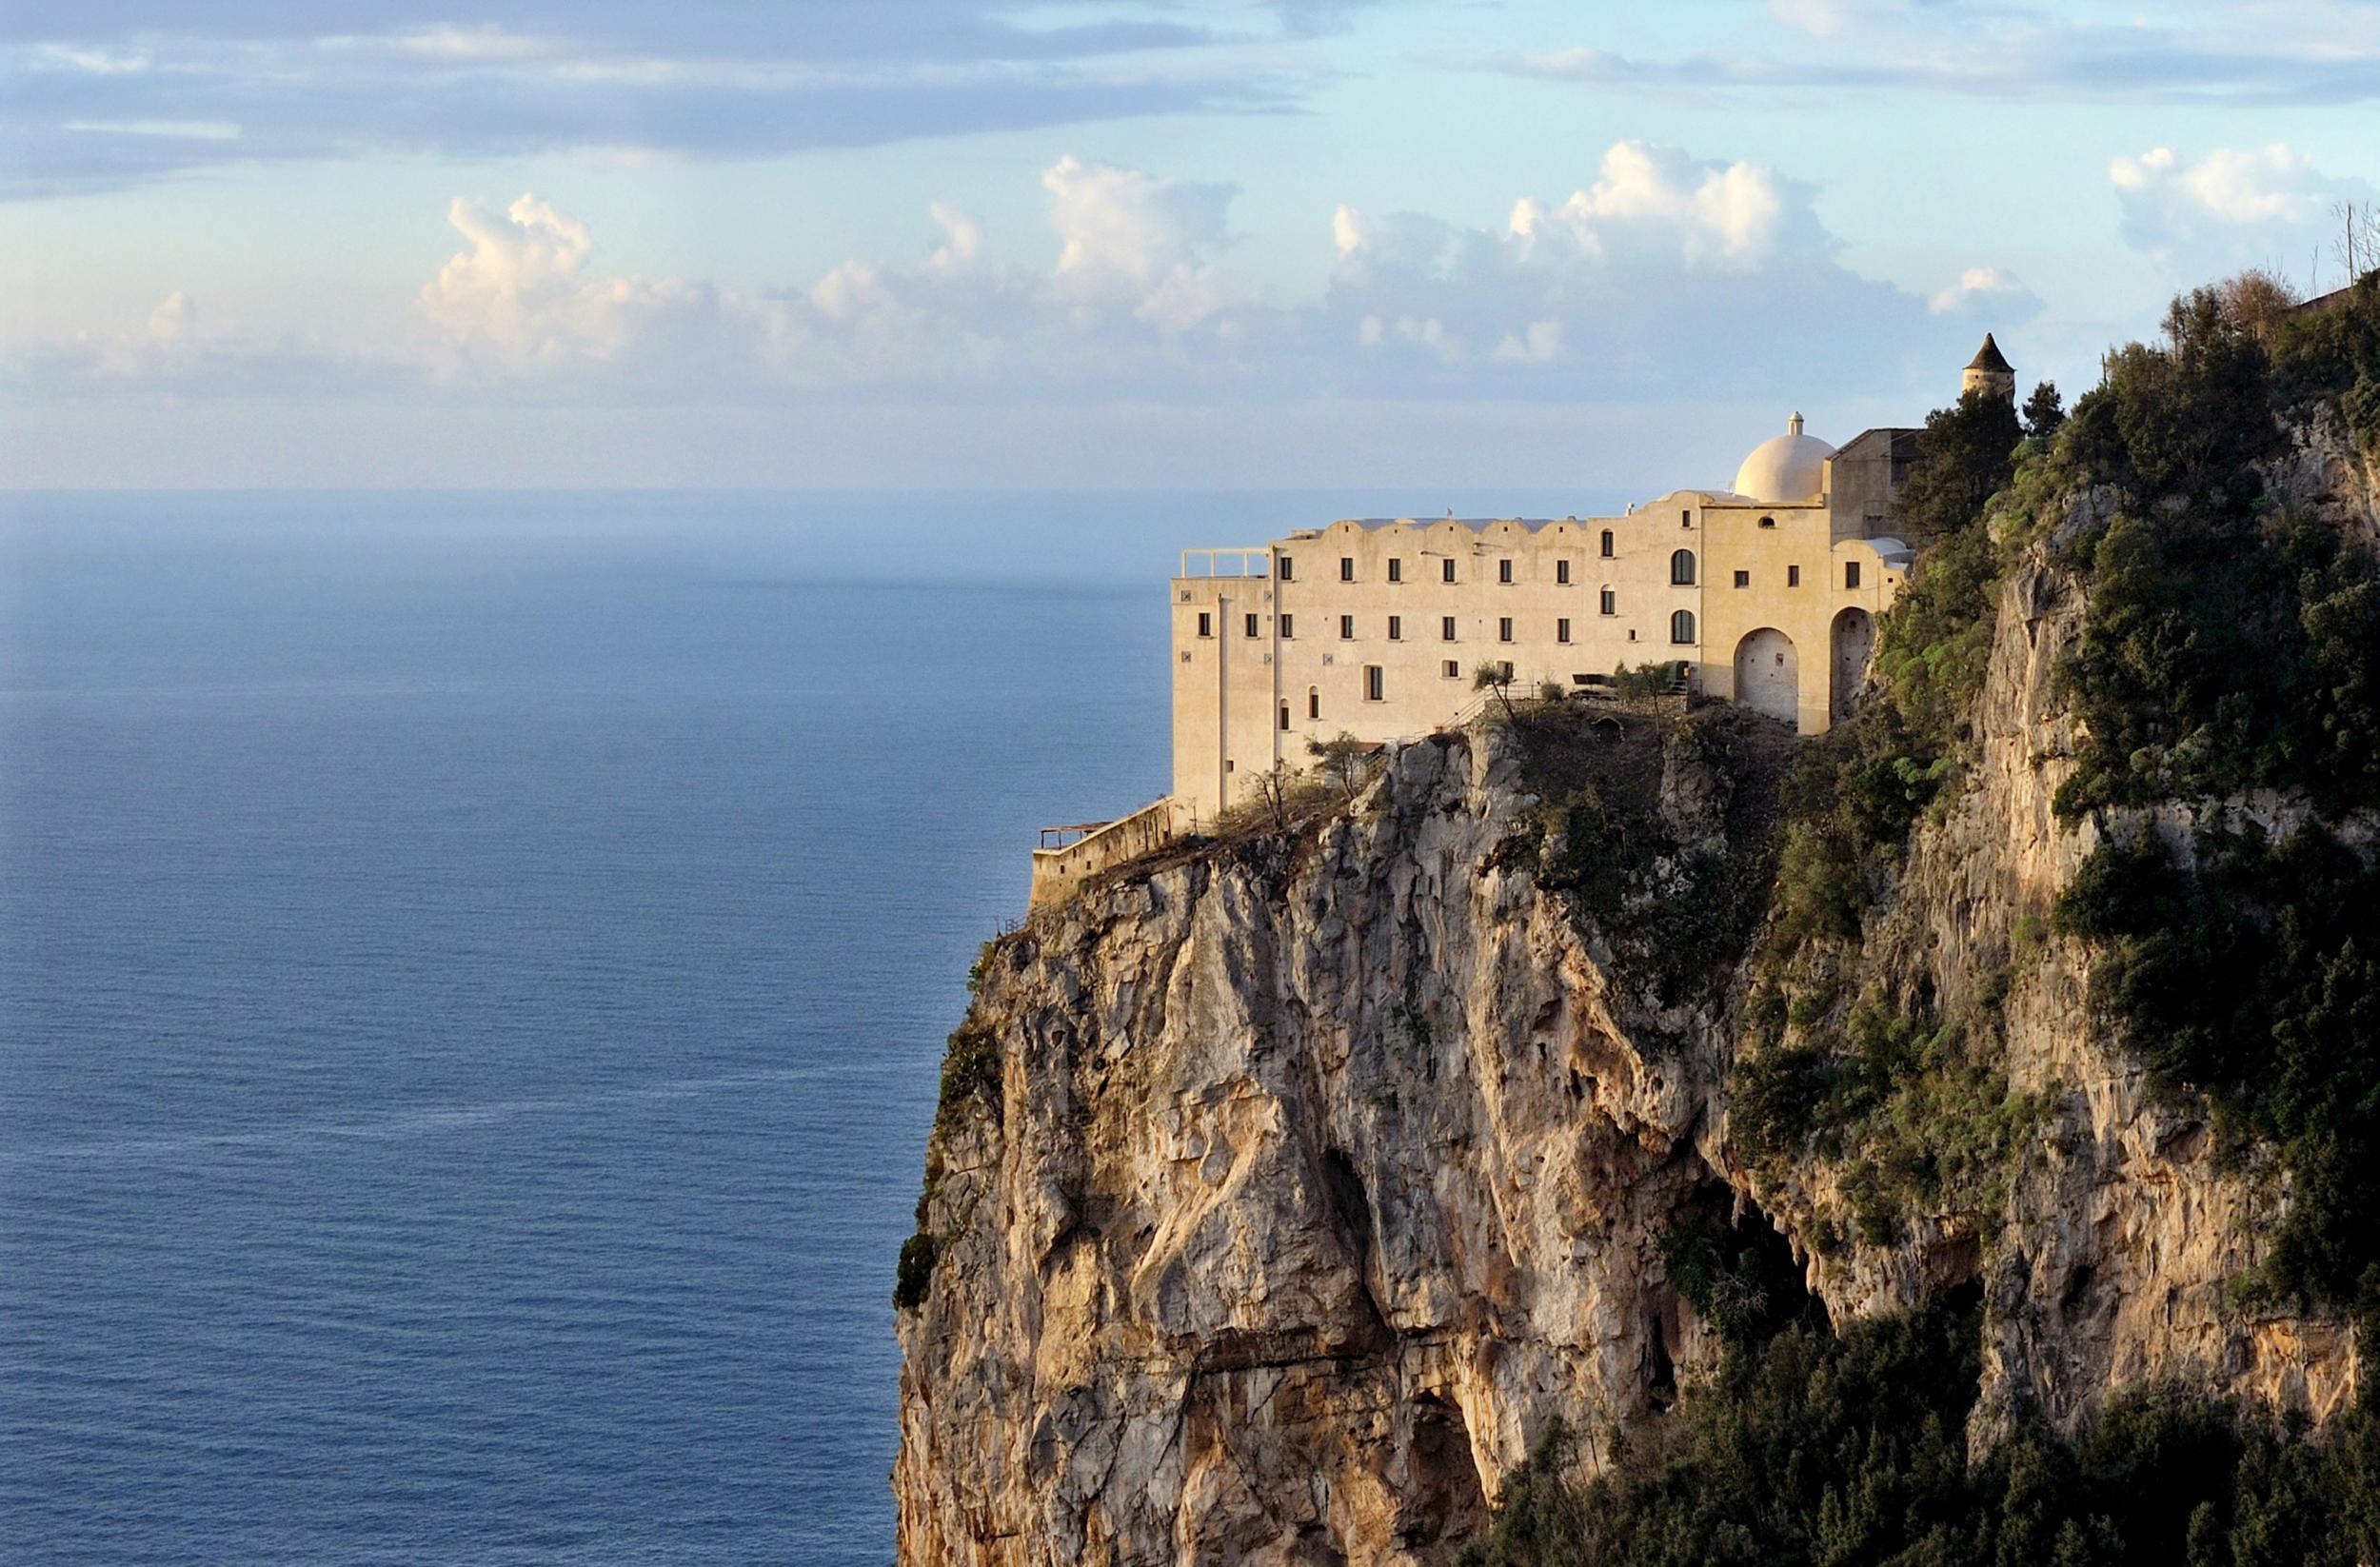 Monastero Santa Rosa: Stay in a converted monastery on the Amalfi Coast